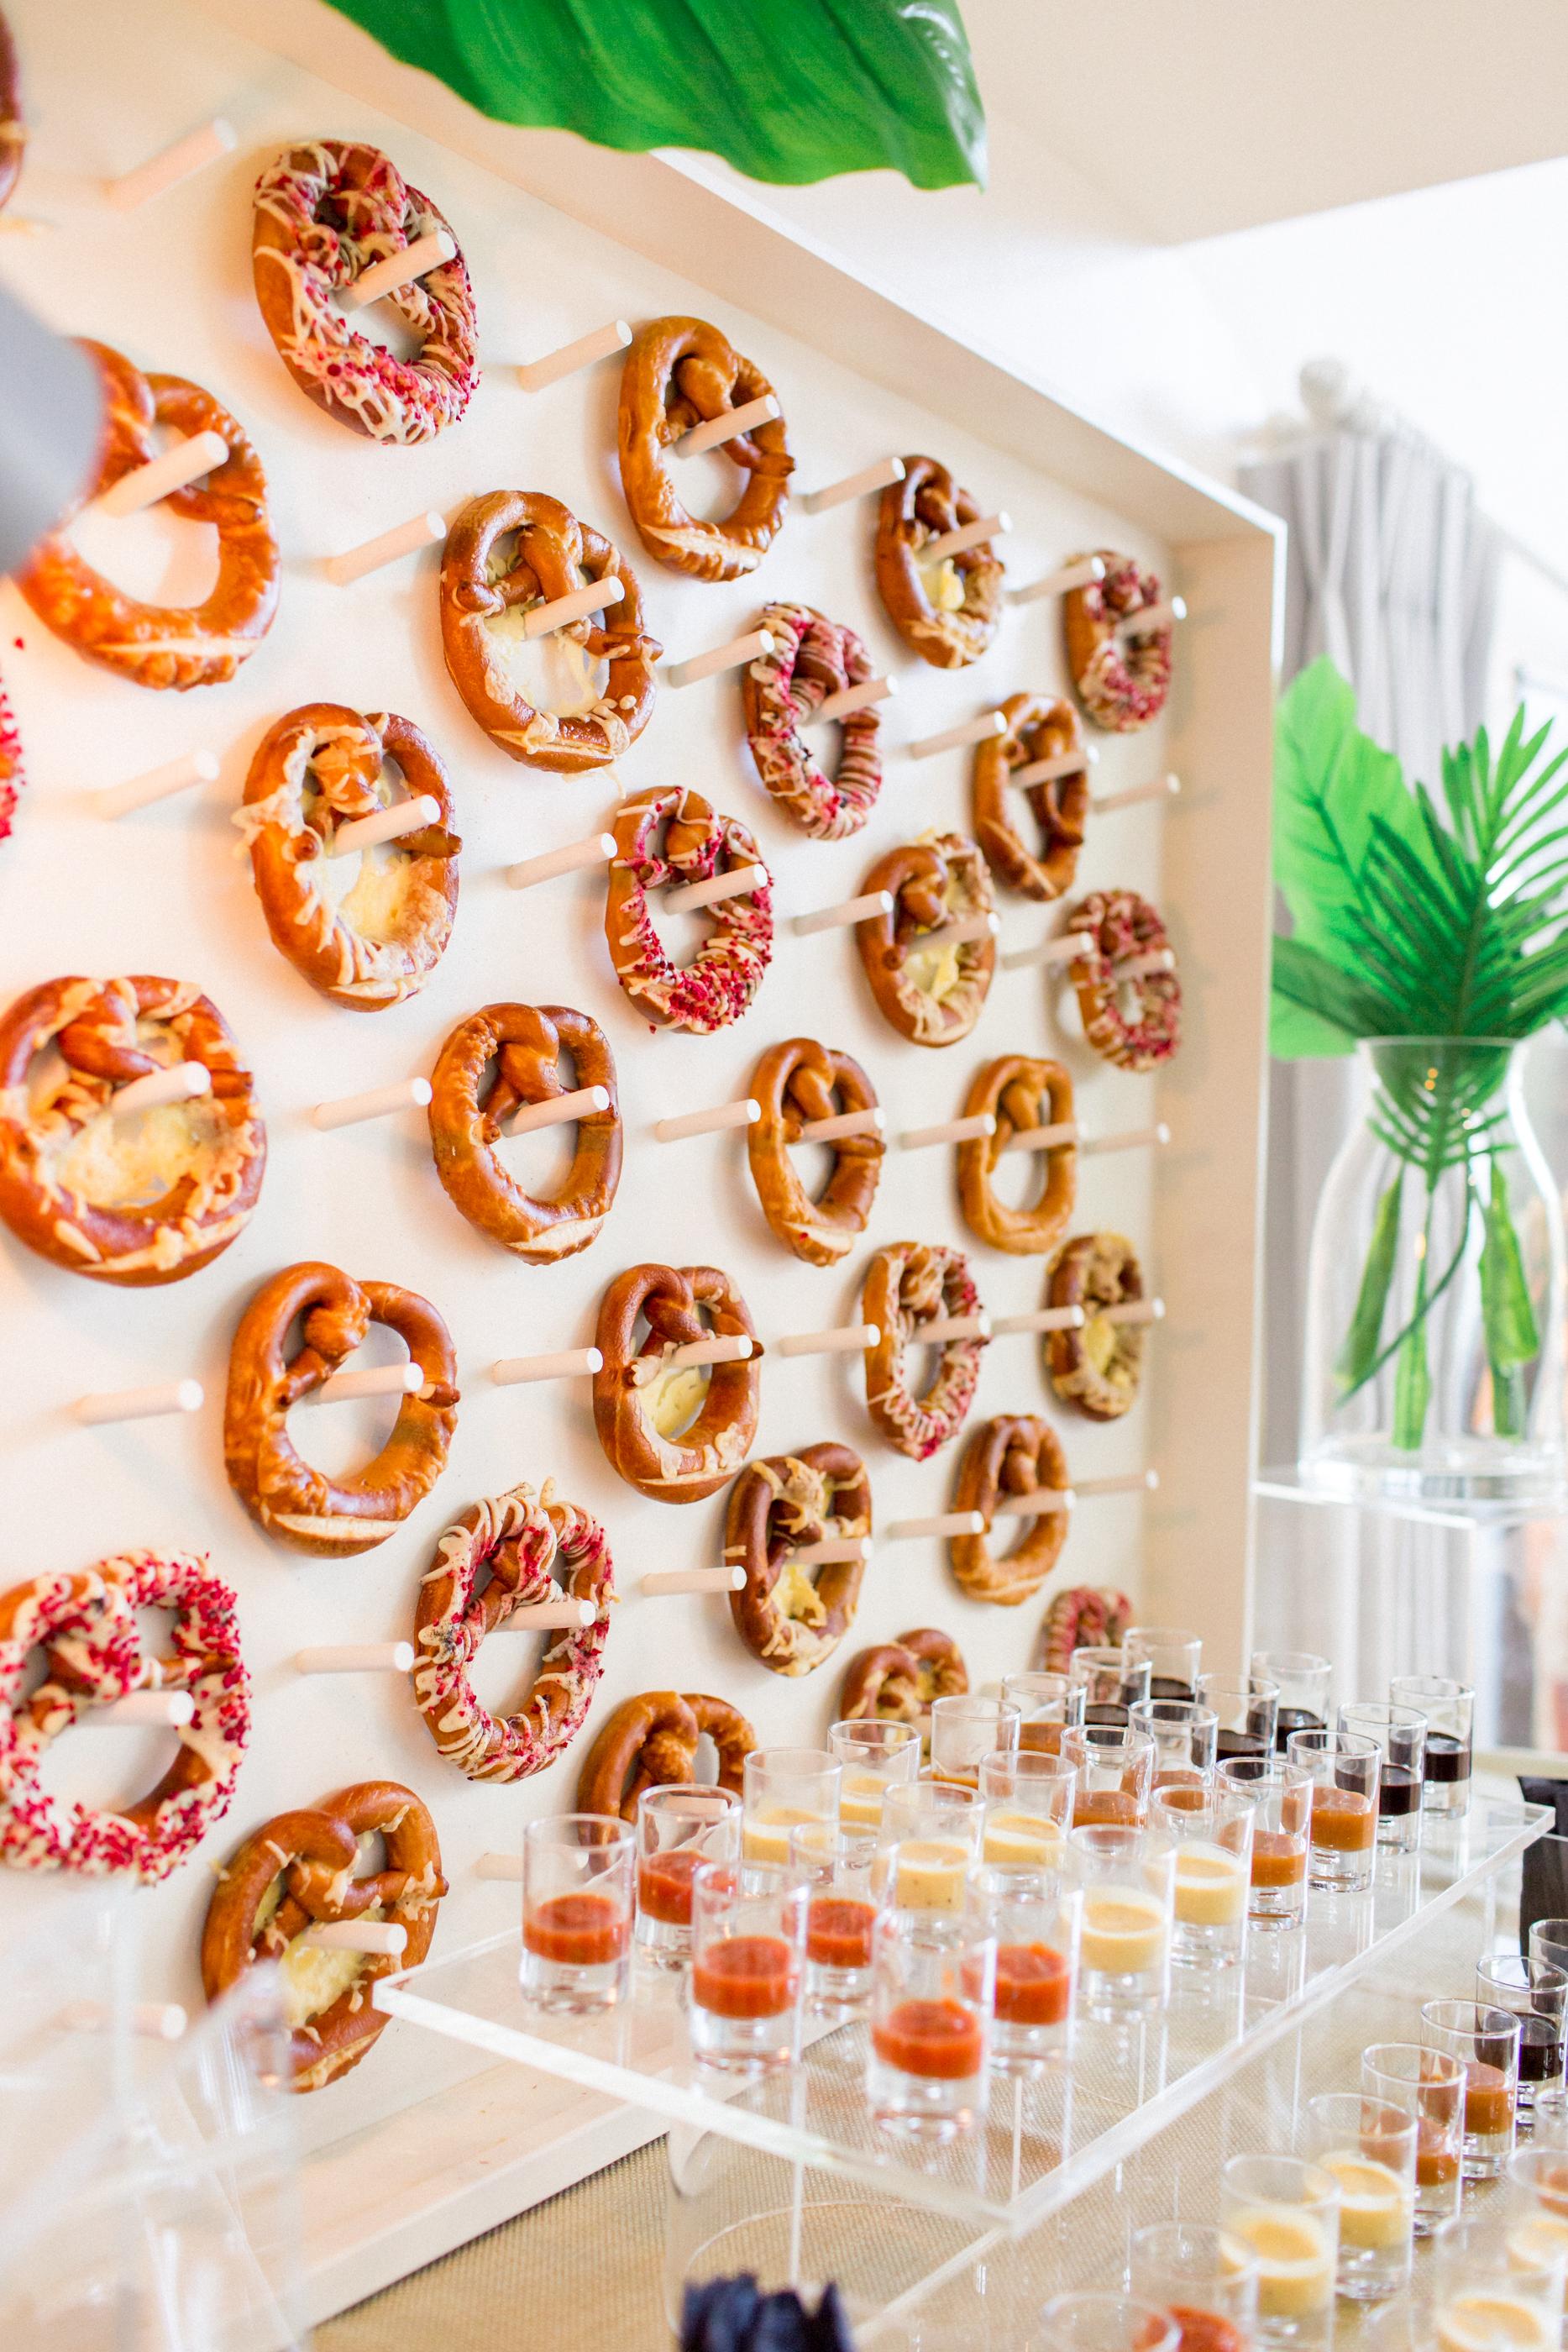 pretzel food wall with condiments